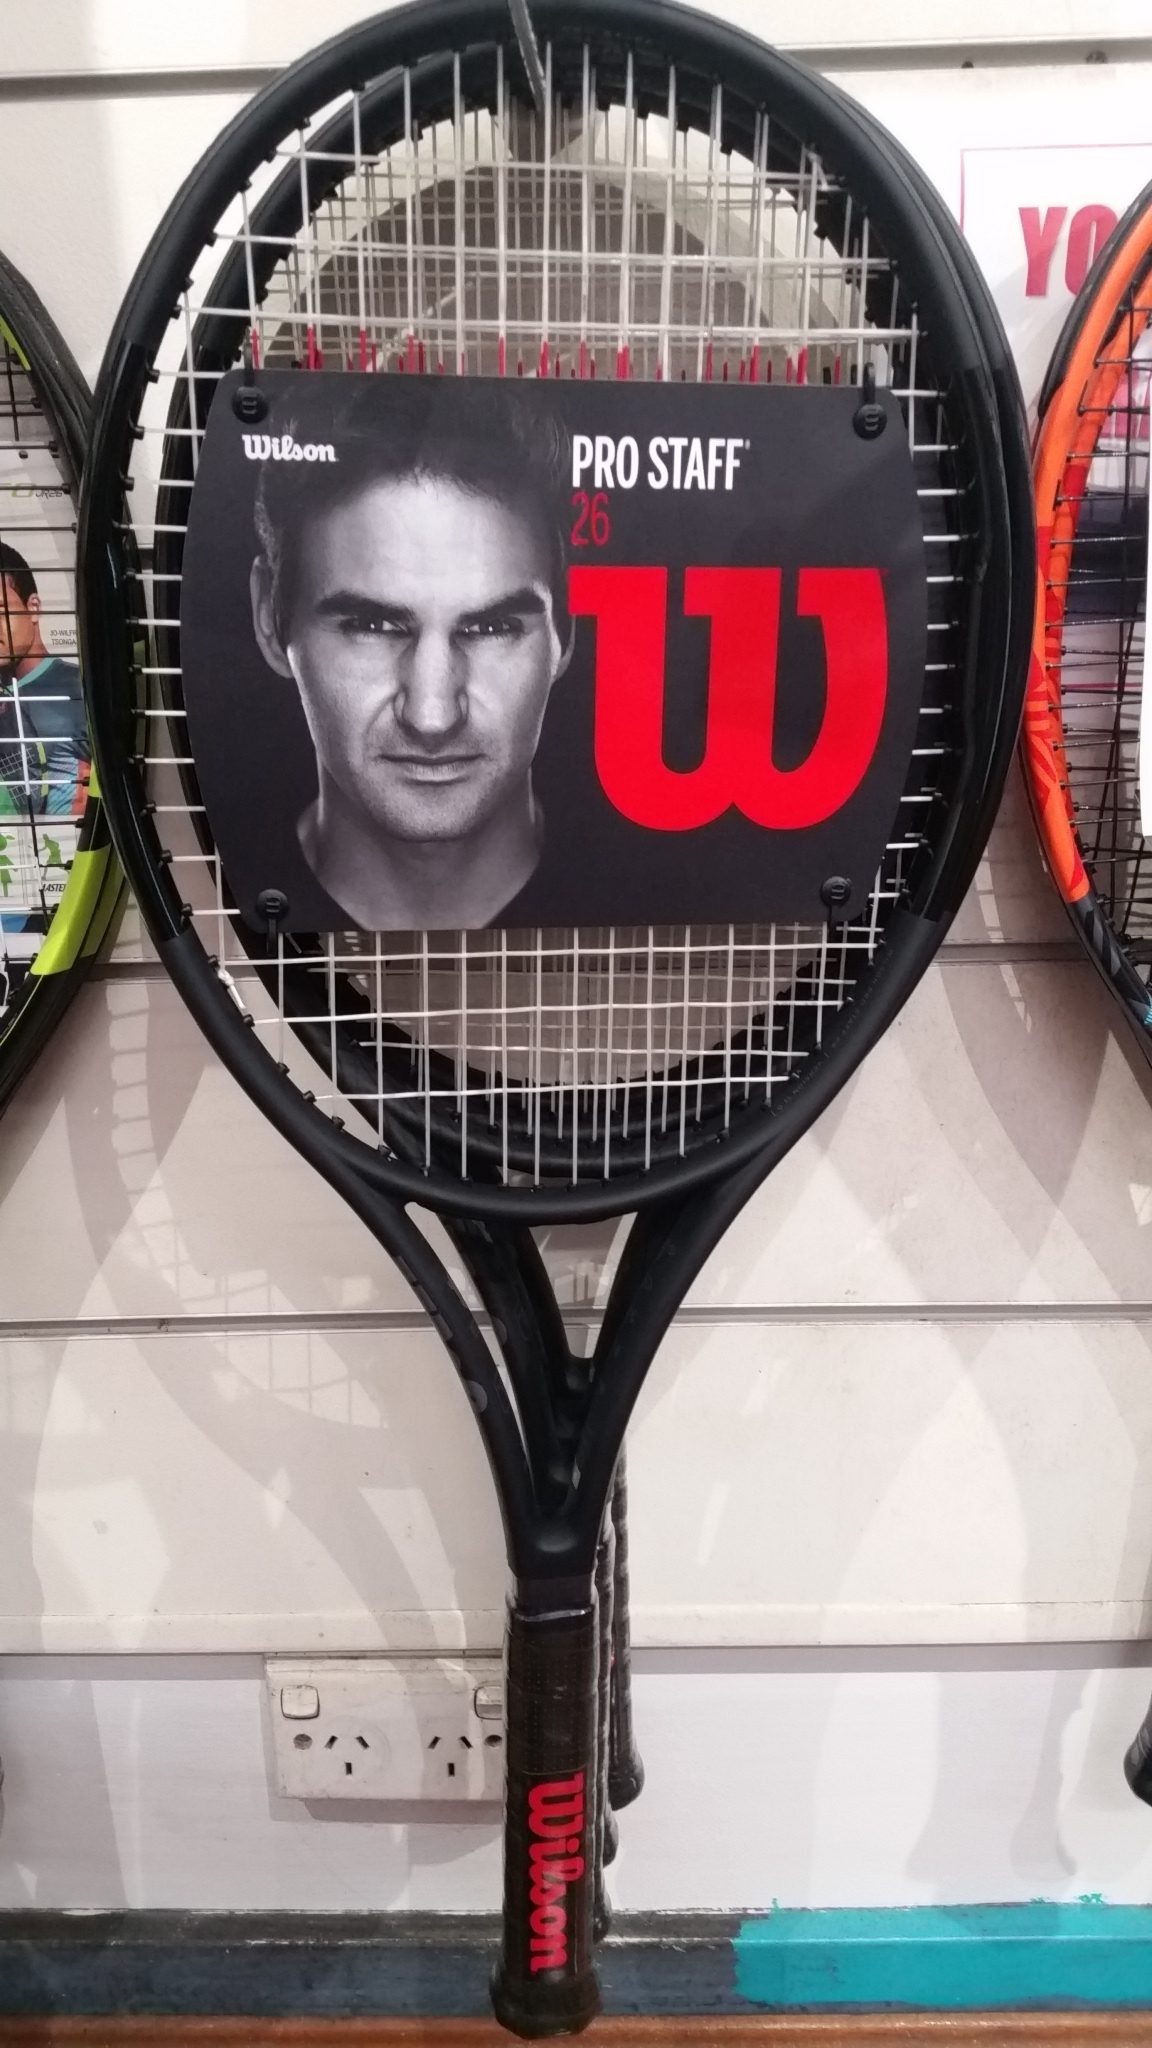 Wilson Pro Staff >> Wilson Prostaff 26